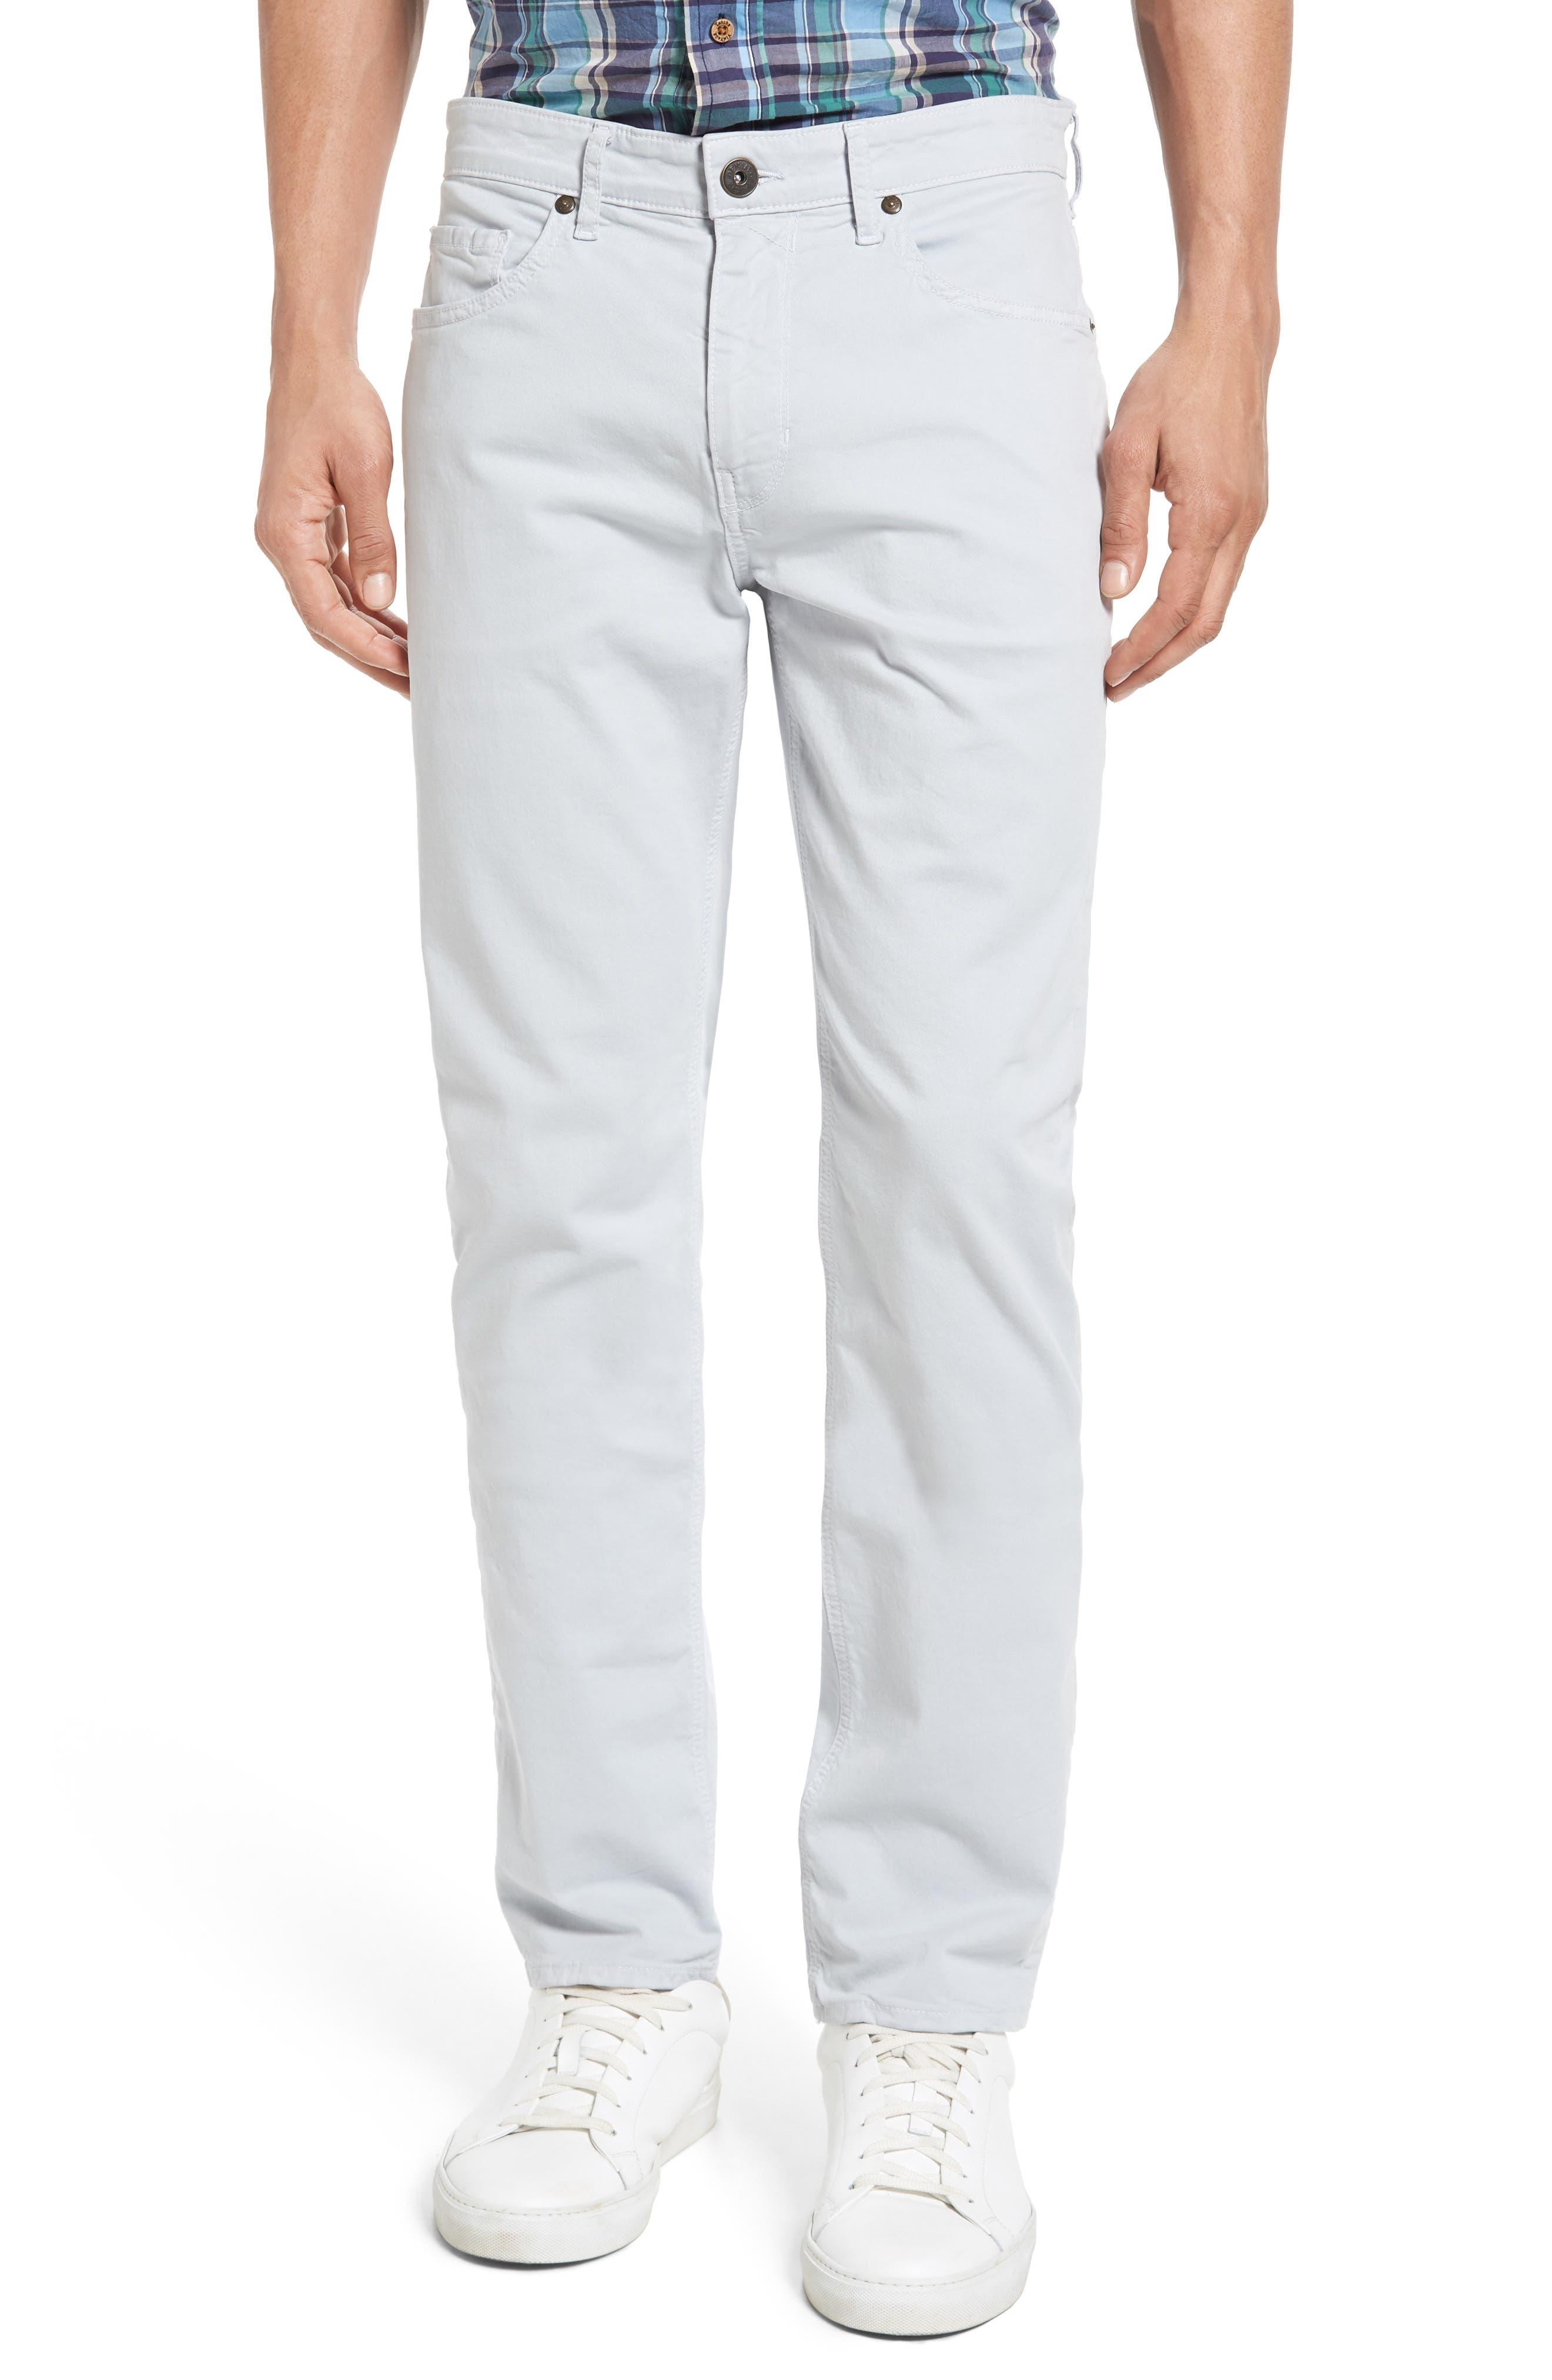 PAIGE Lennox Skinny Fit Jeans